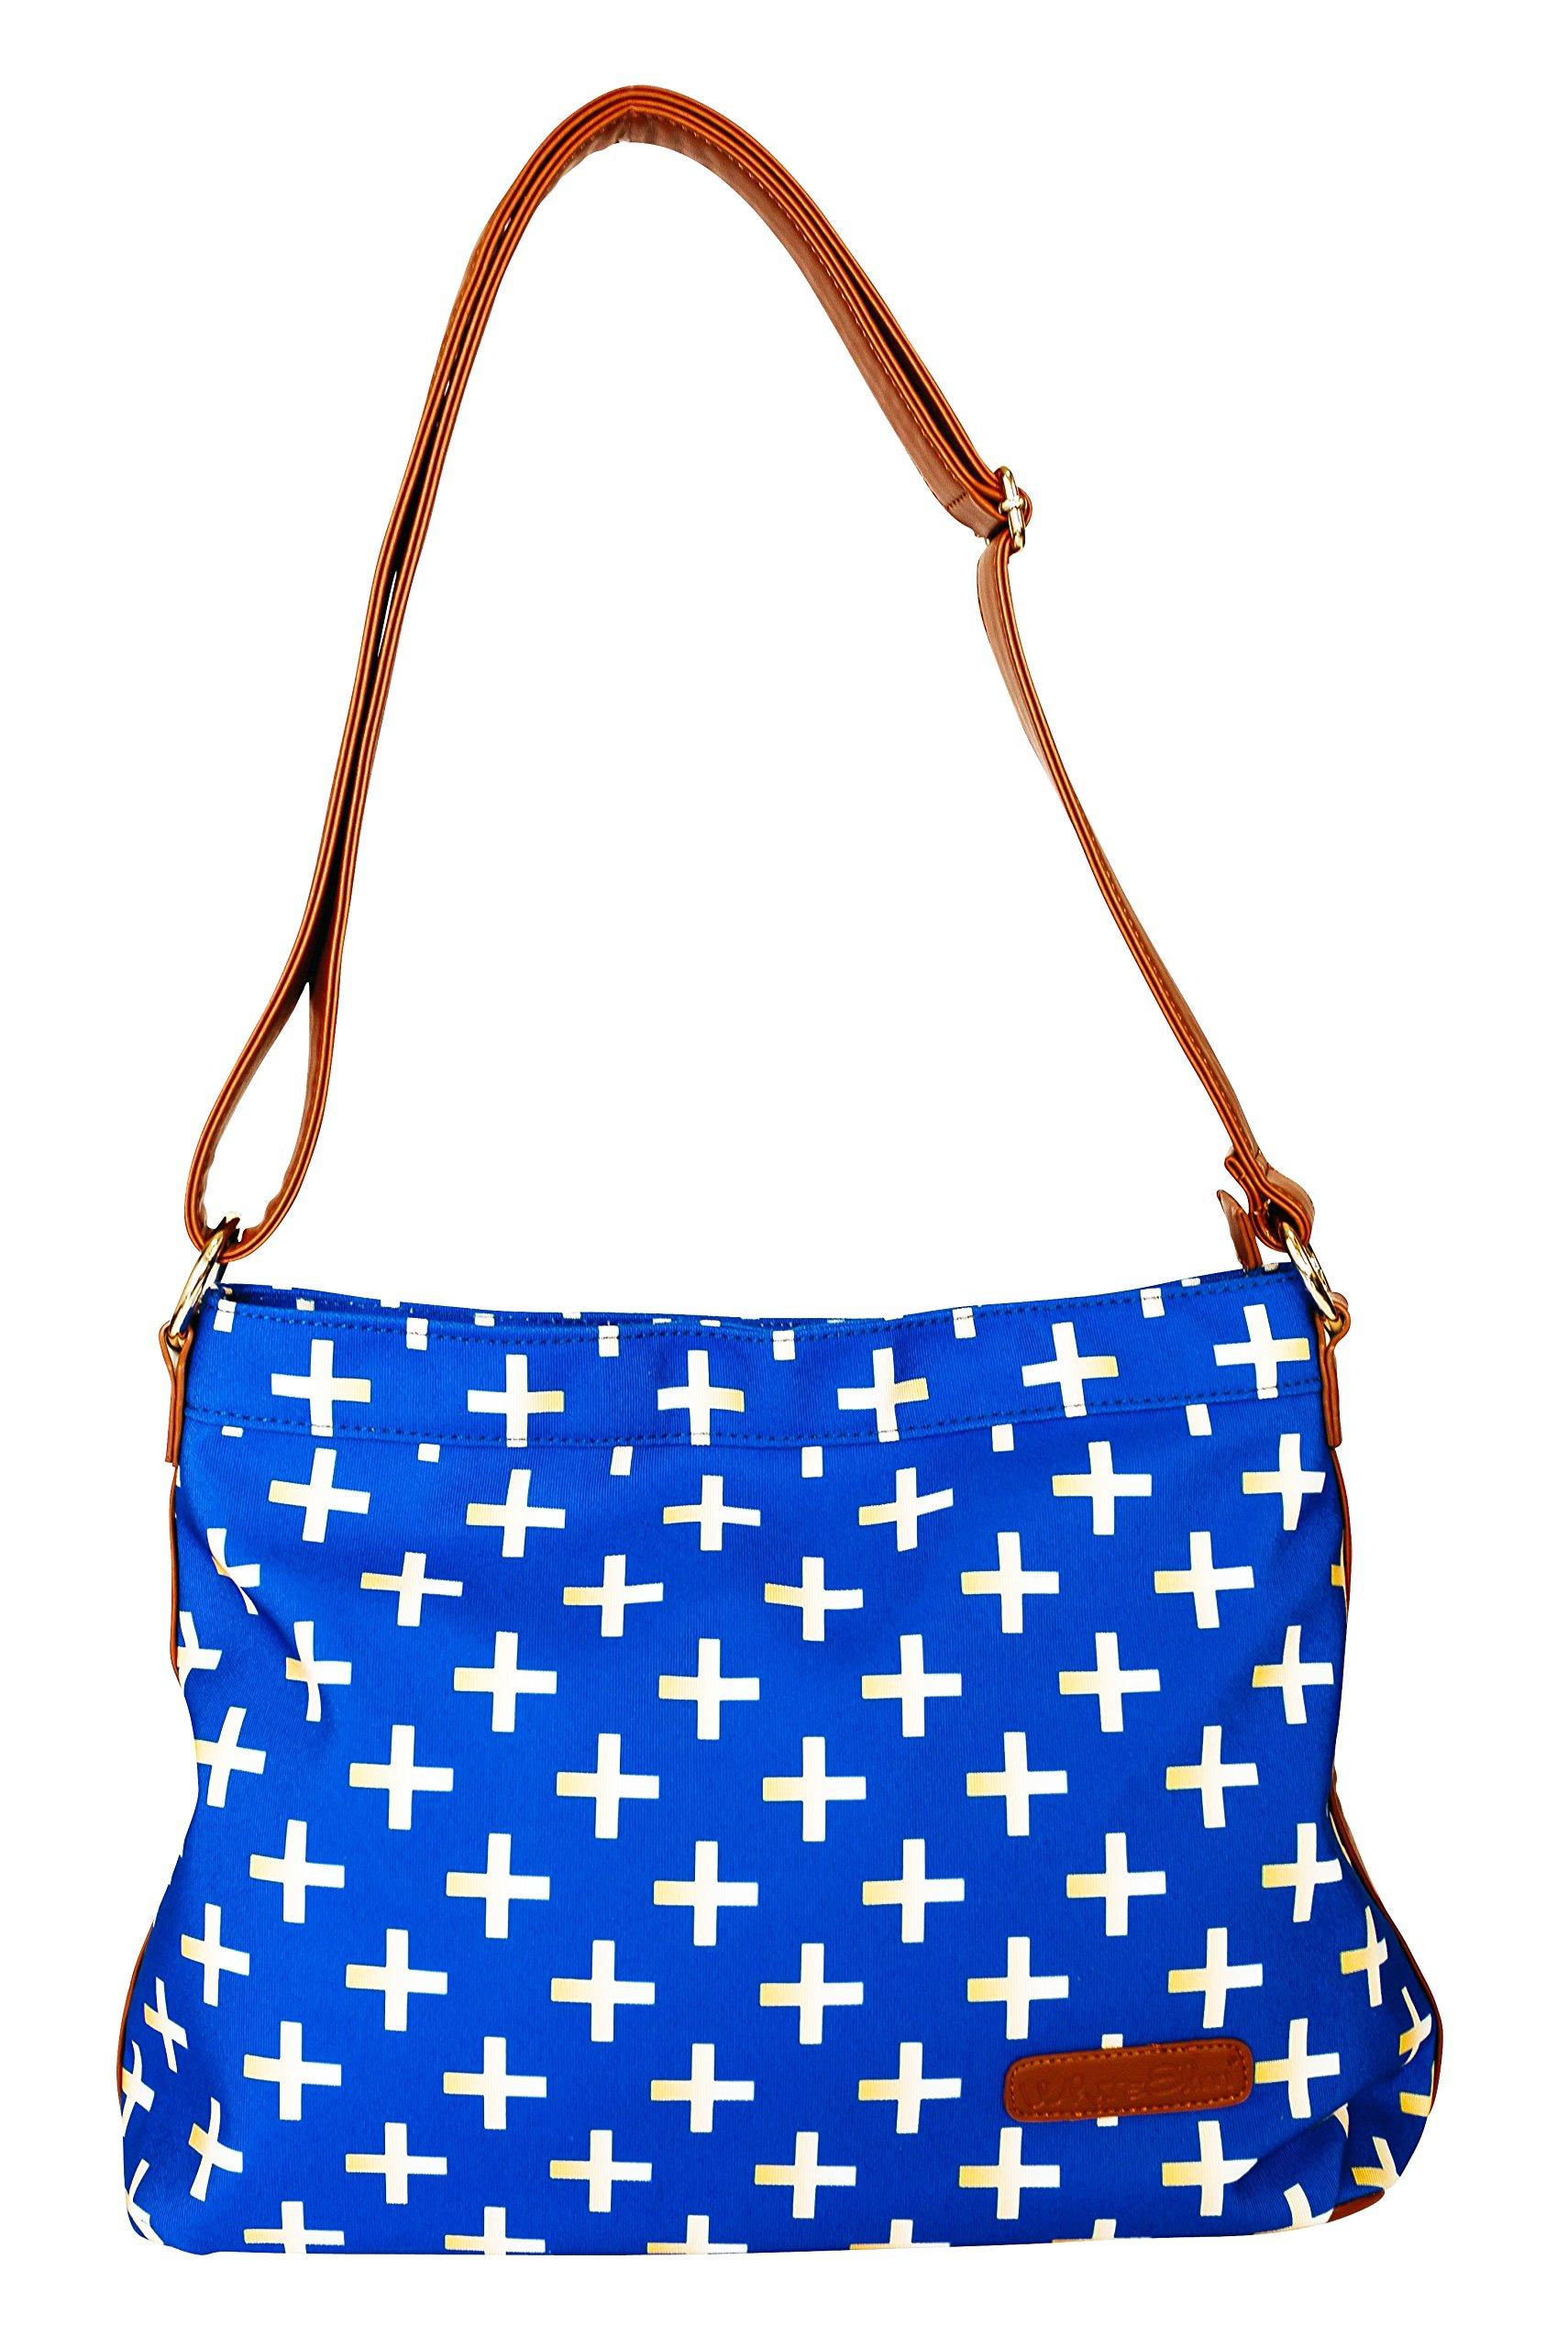 Blue & Gold Crosses Hobo Crossbody Bag by White Elm | Canvas & Vegan Leather